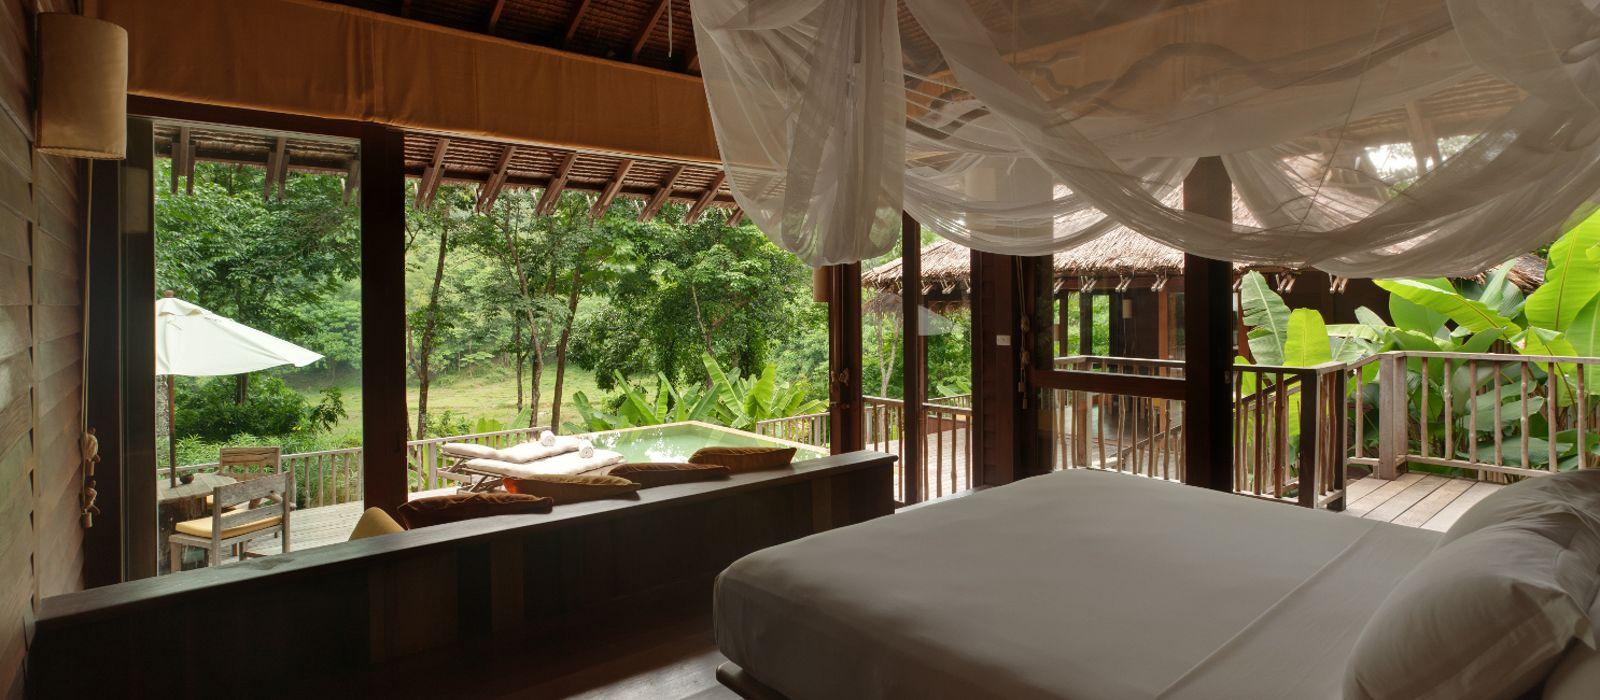 Hotel Six Senses Yao Noi Thailand